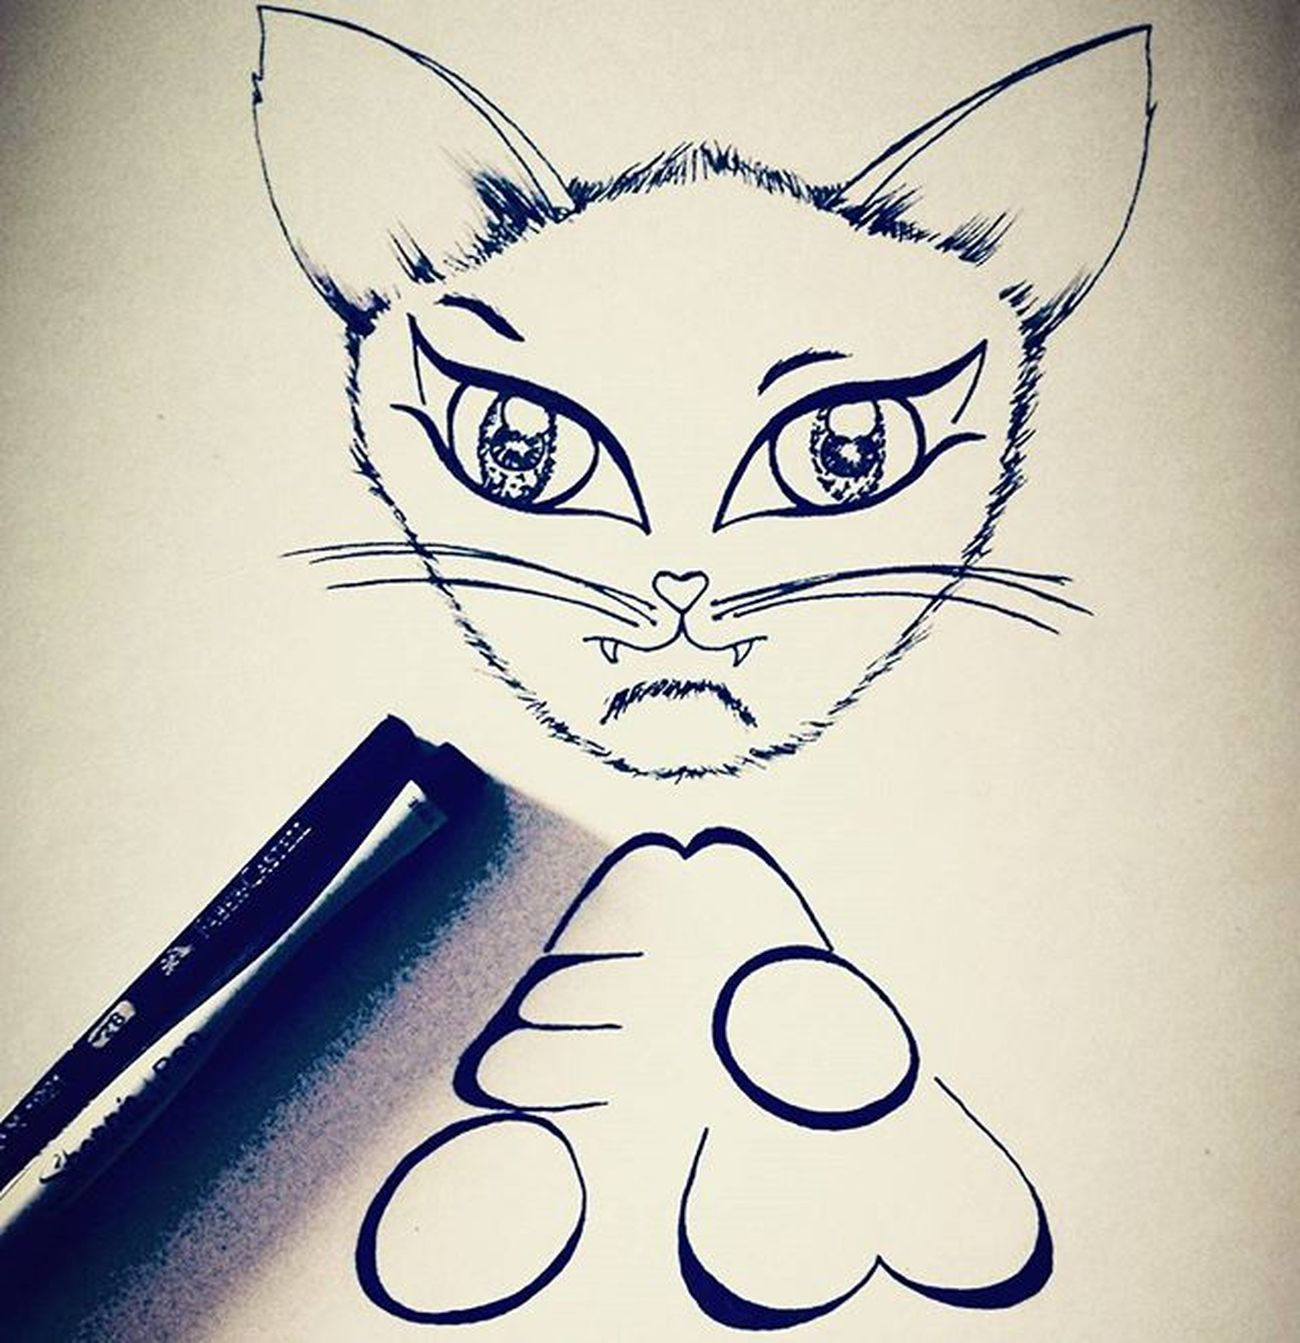 Meeeoooooowwww 🐈🐱 😊 Kitty Creative_animalart Animalart Animals Cat Kitten Love Cute Meow Eyes Arts_help Artsy Creative Lettering Followforfollow Art_collective Artofdrawingg Arts_gallery Blackpen BlackInk Lineart Blackandwhite Cats Sketchbook Sketch_daily